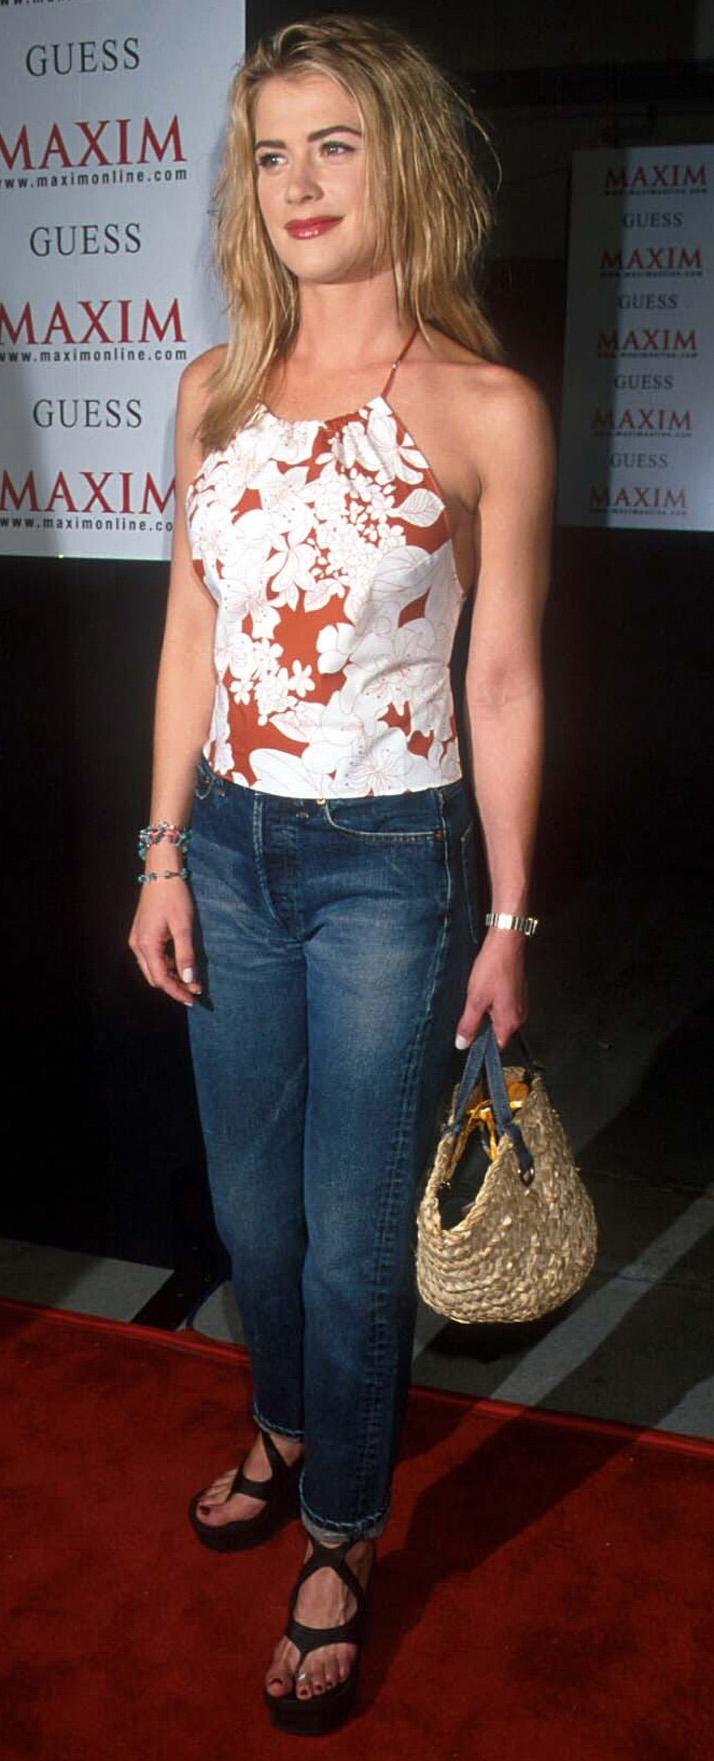 Cannes Kristy Swanson Stock Photo - Alamy |Kristy Swanson Weight Gain